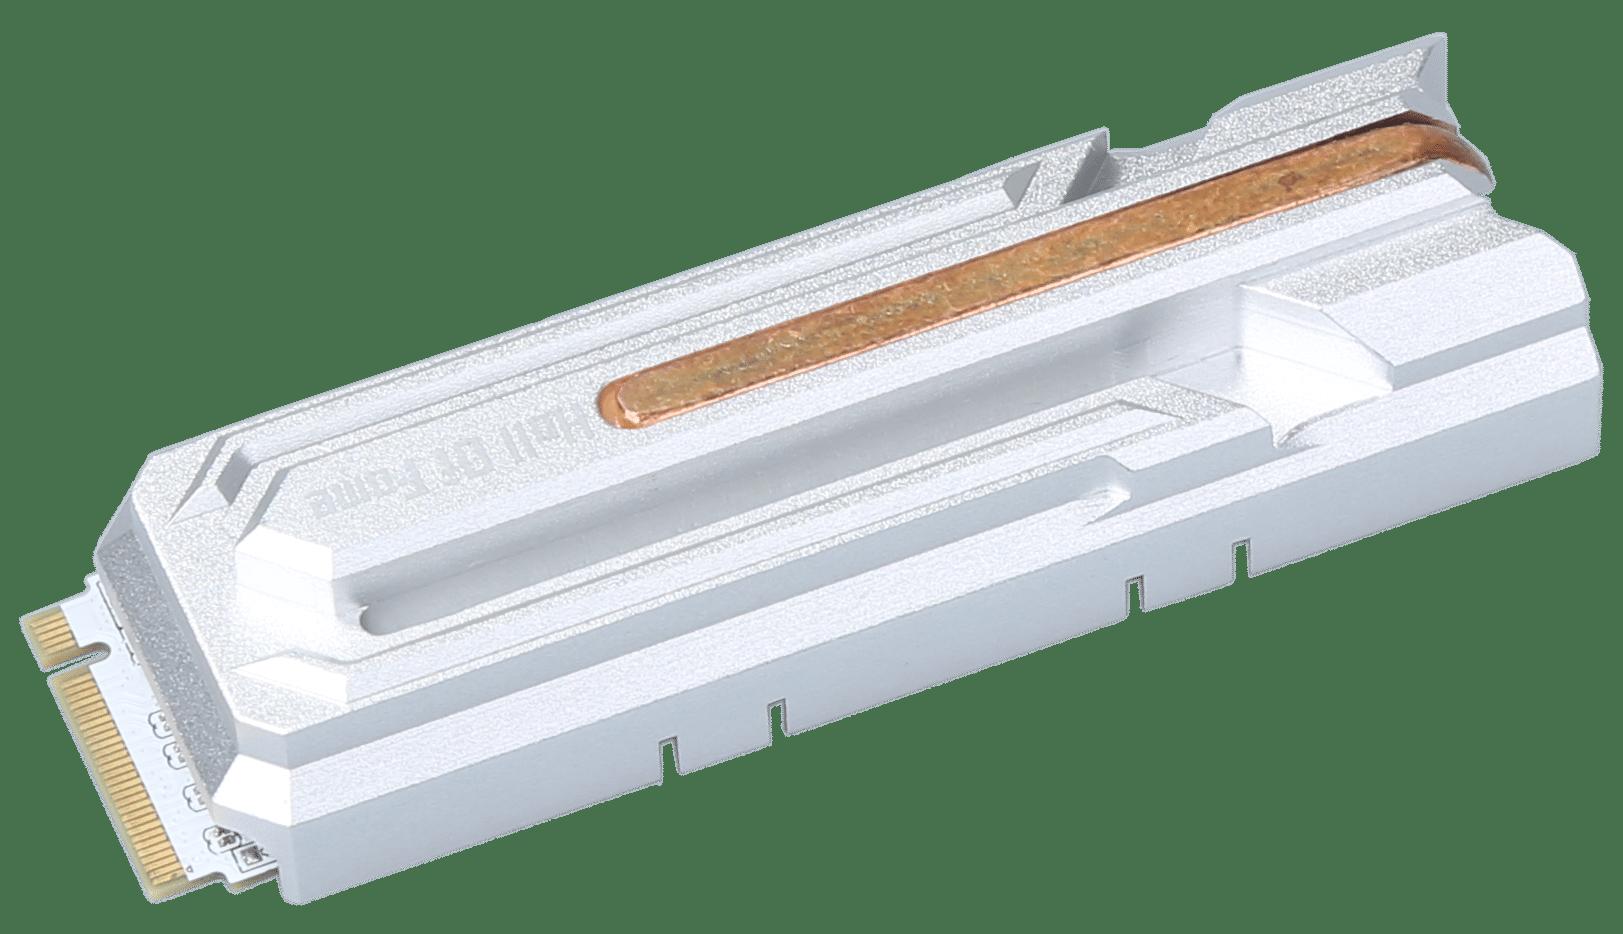 GALAX HOF Pro PCIe M.2